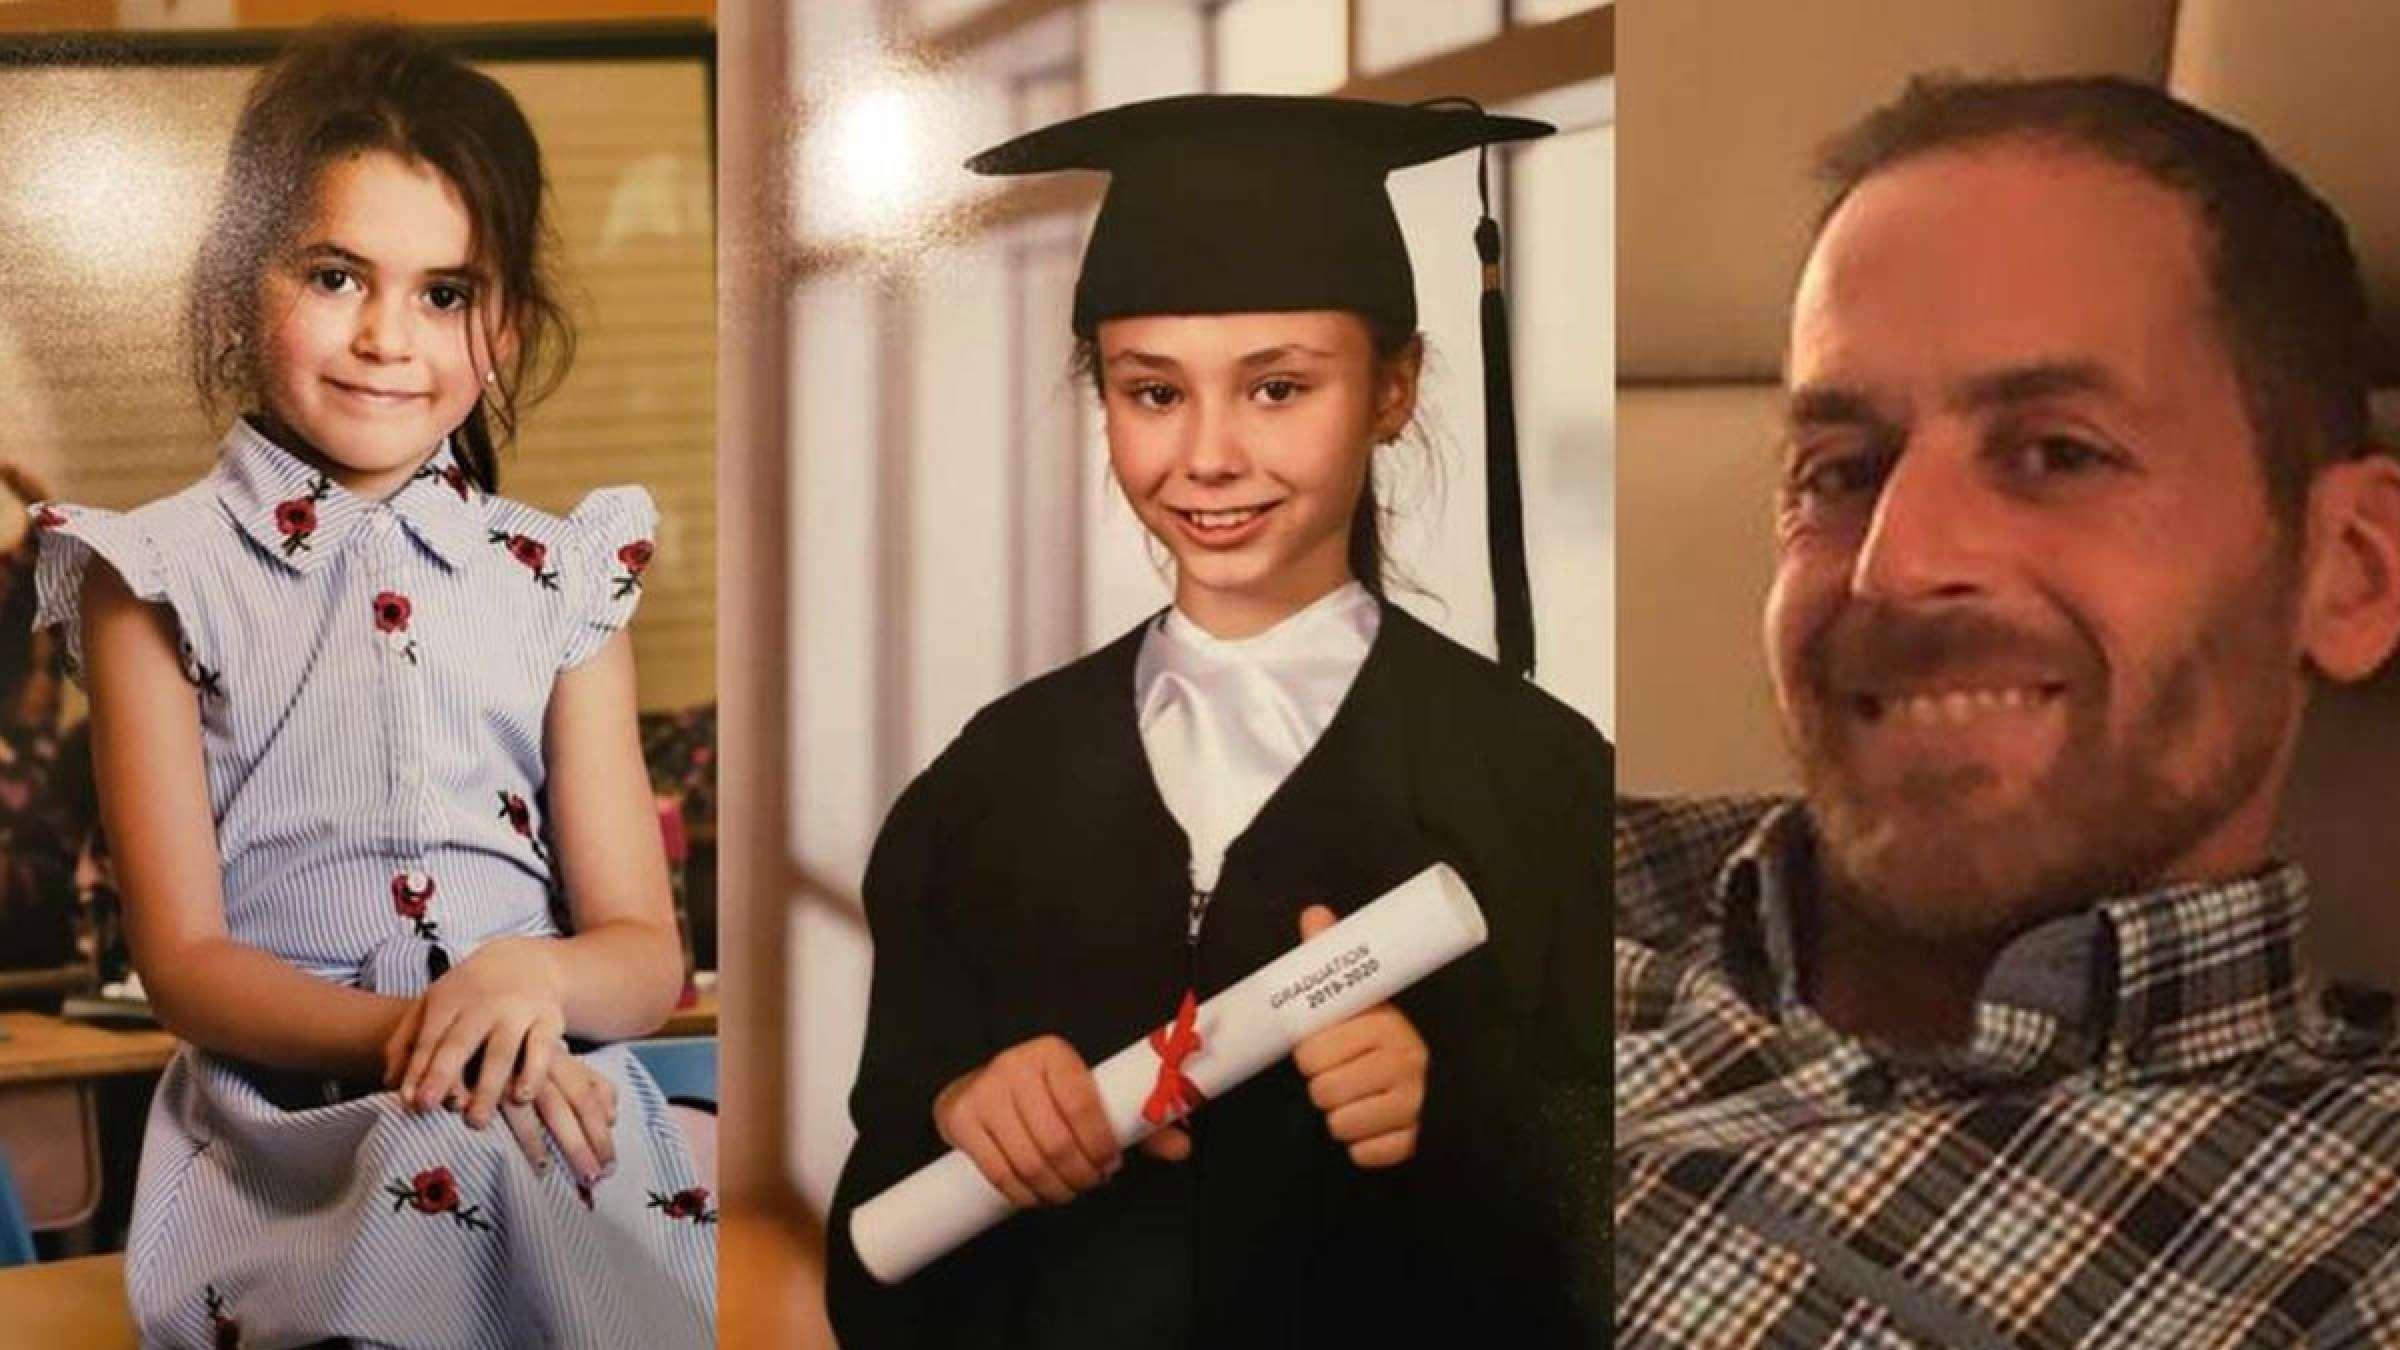 اخبار-کانادا-پلیس-کبک-جسد-پدری-که-دو-دخترش-را-ربوده-و-کشته-بود-پیدا-کرد